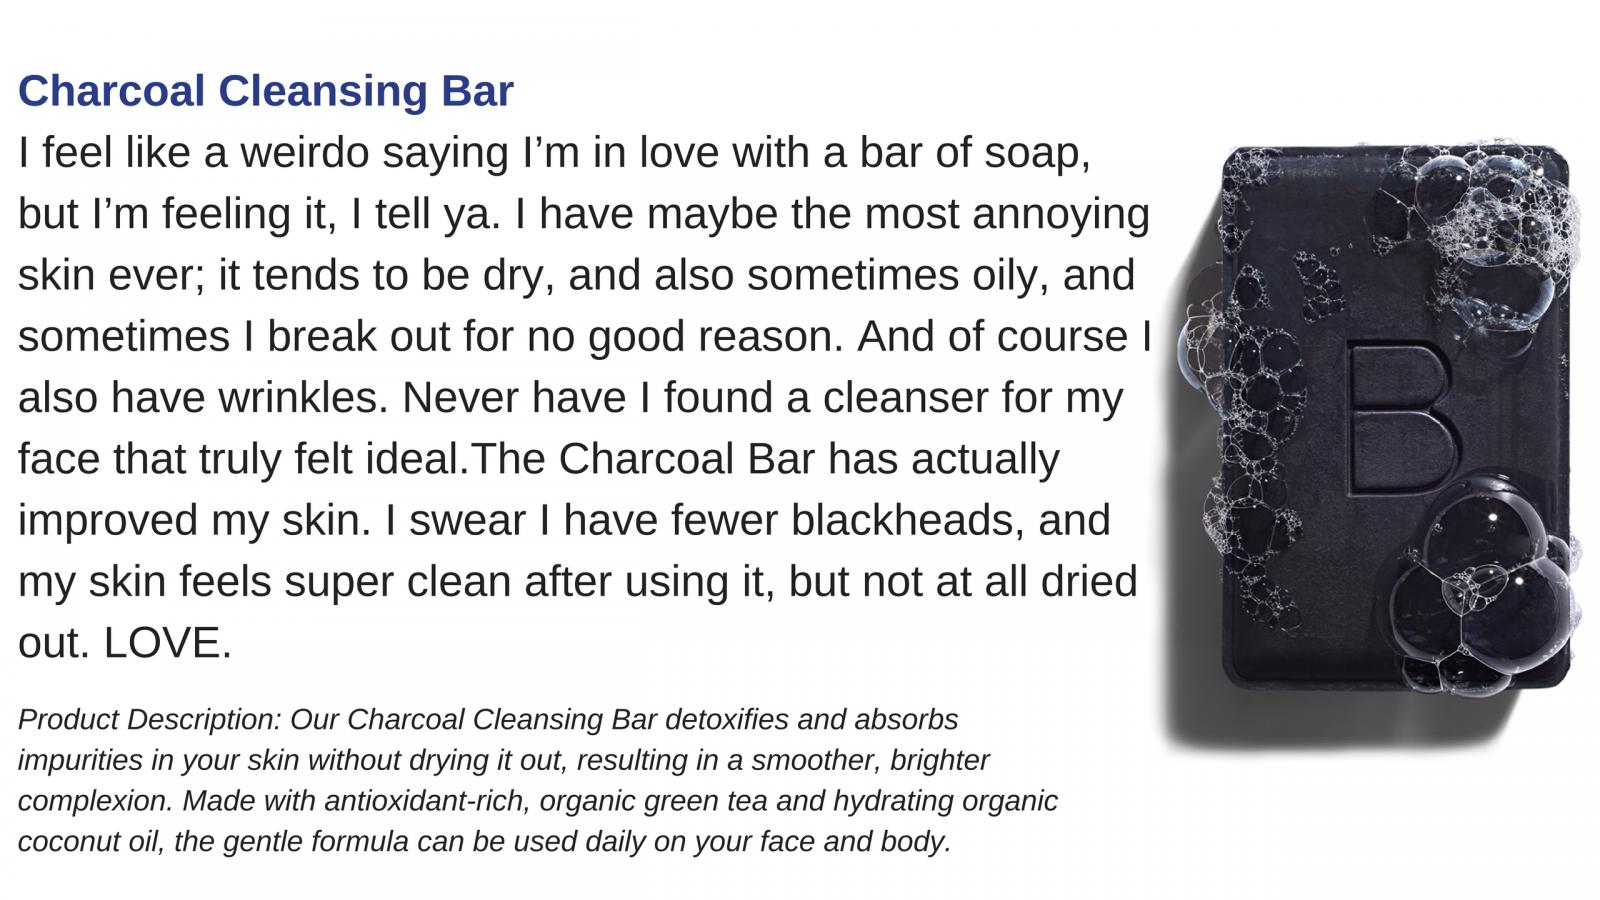 beautycounter charcoal bar